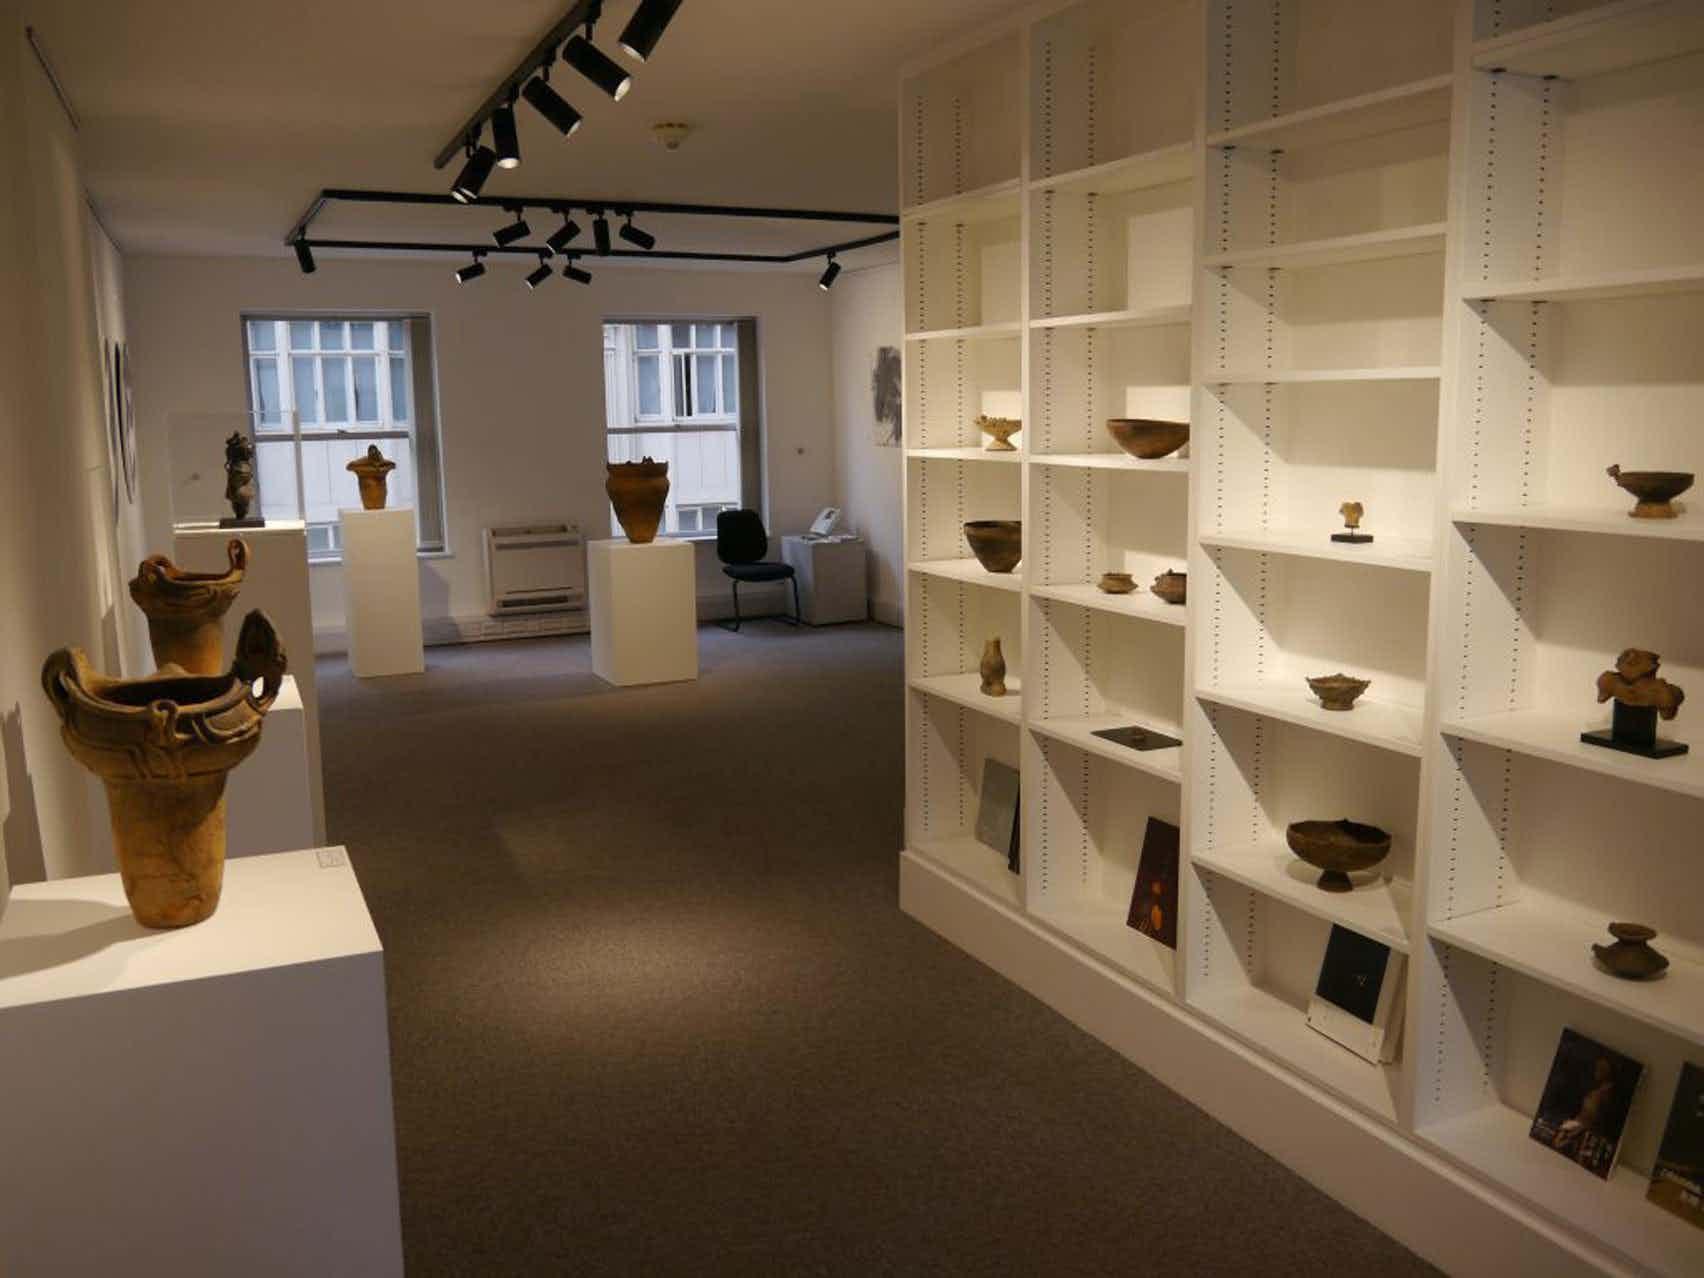 2nd Floor at Brian Haughton Gallery, 2nd Floor at Brian Haughton Gallery